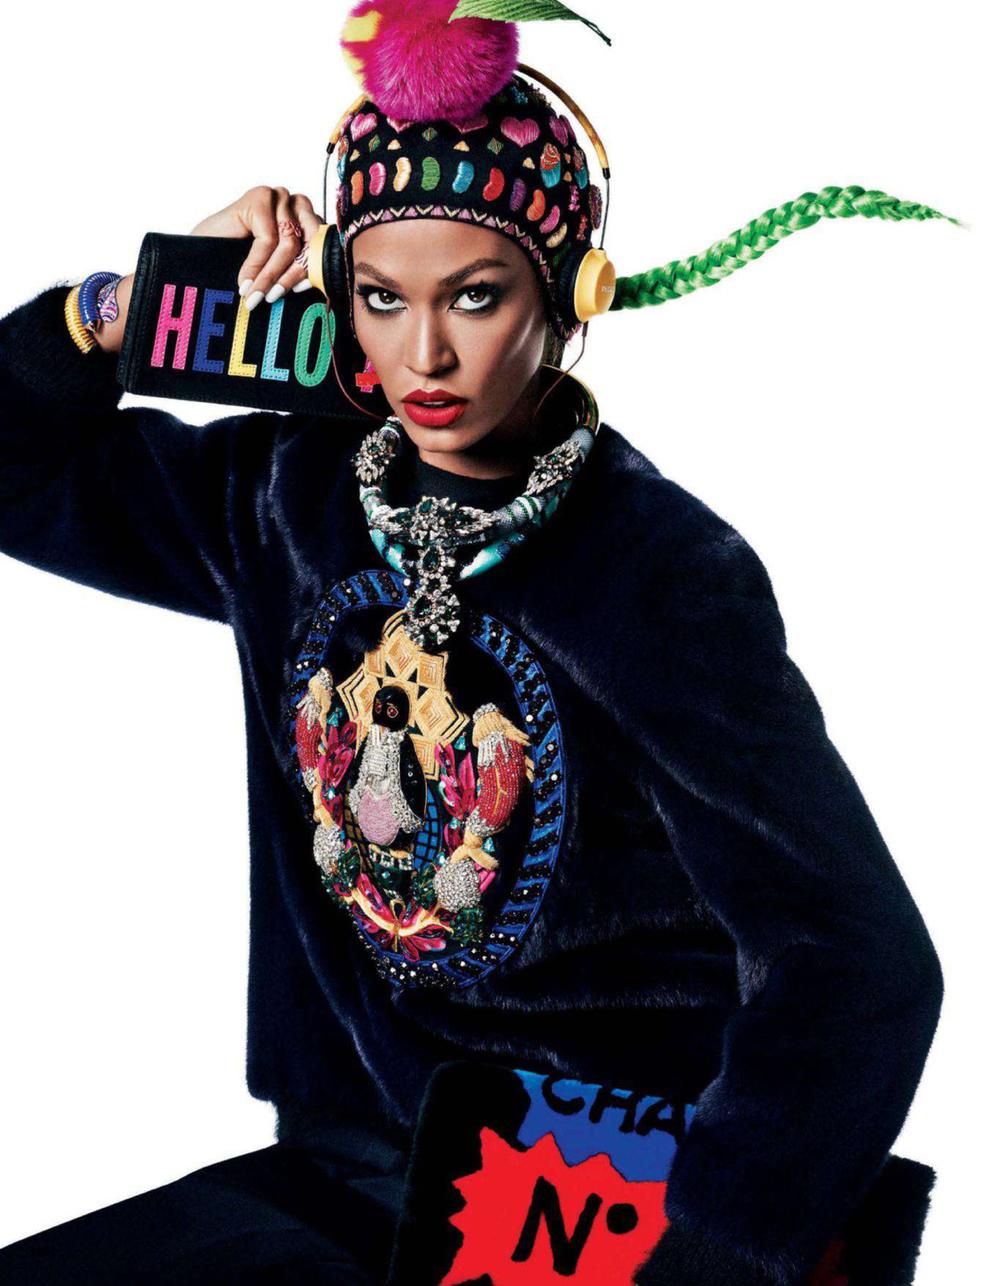 Giampaolo-Sgura-Joan-Smalls-Vogue-Japan-December-2014-1.jpg